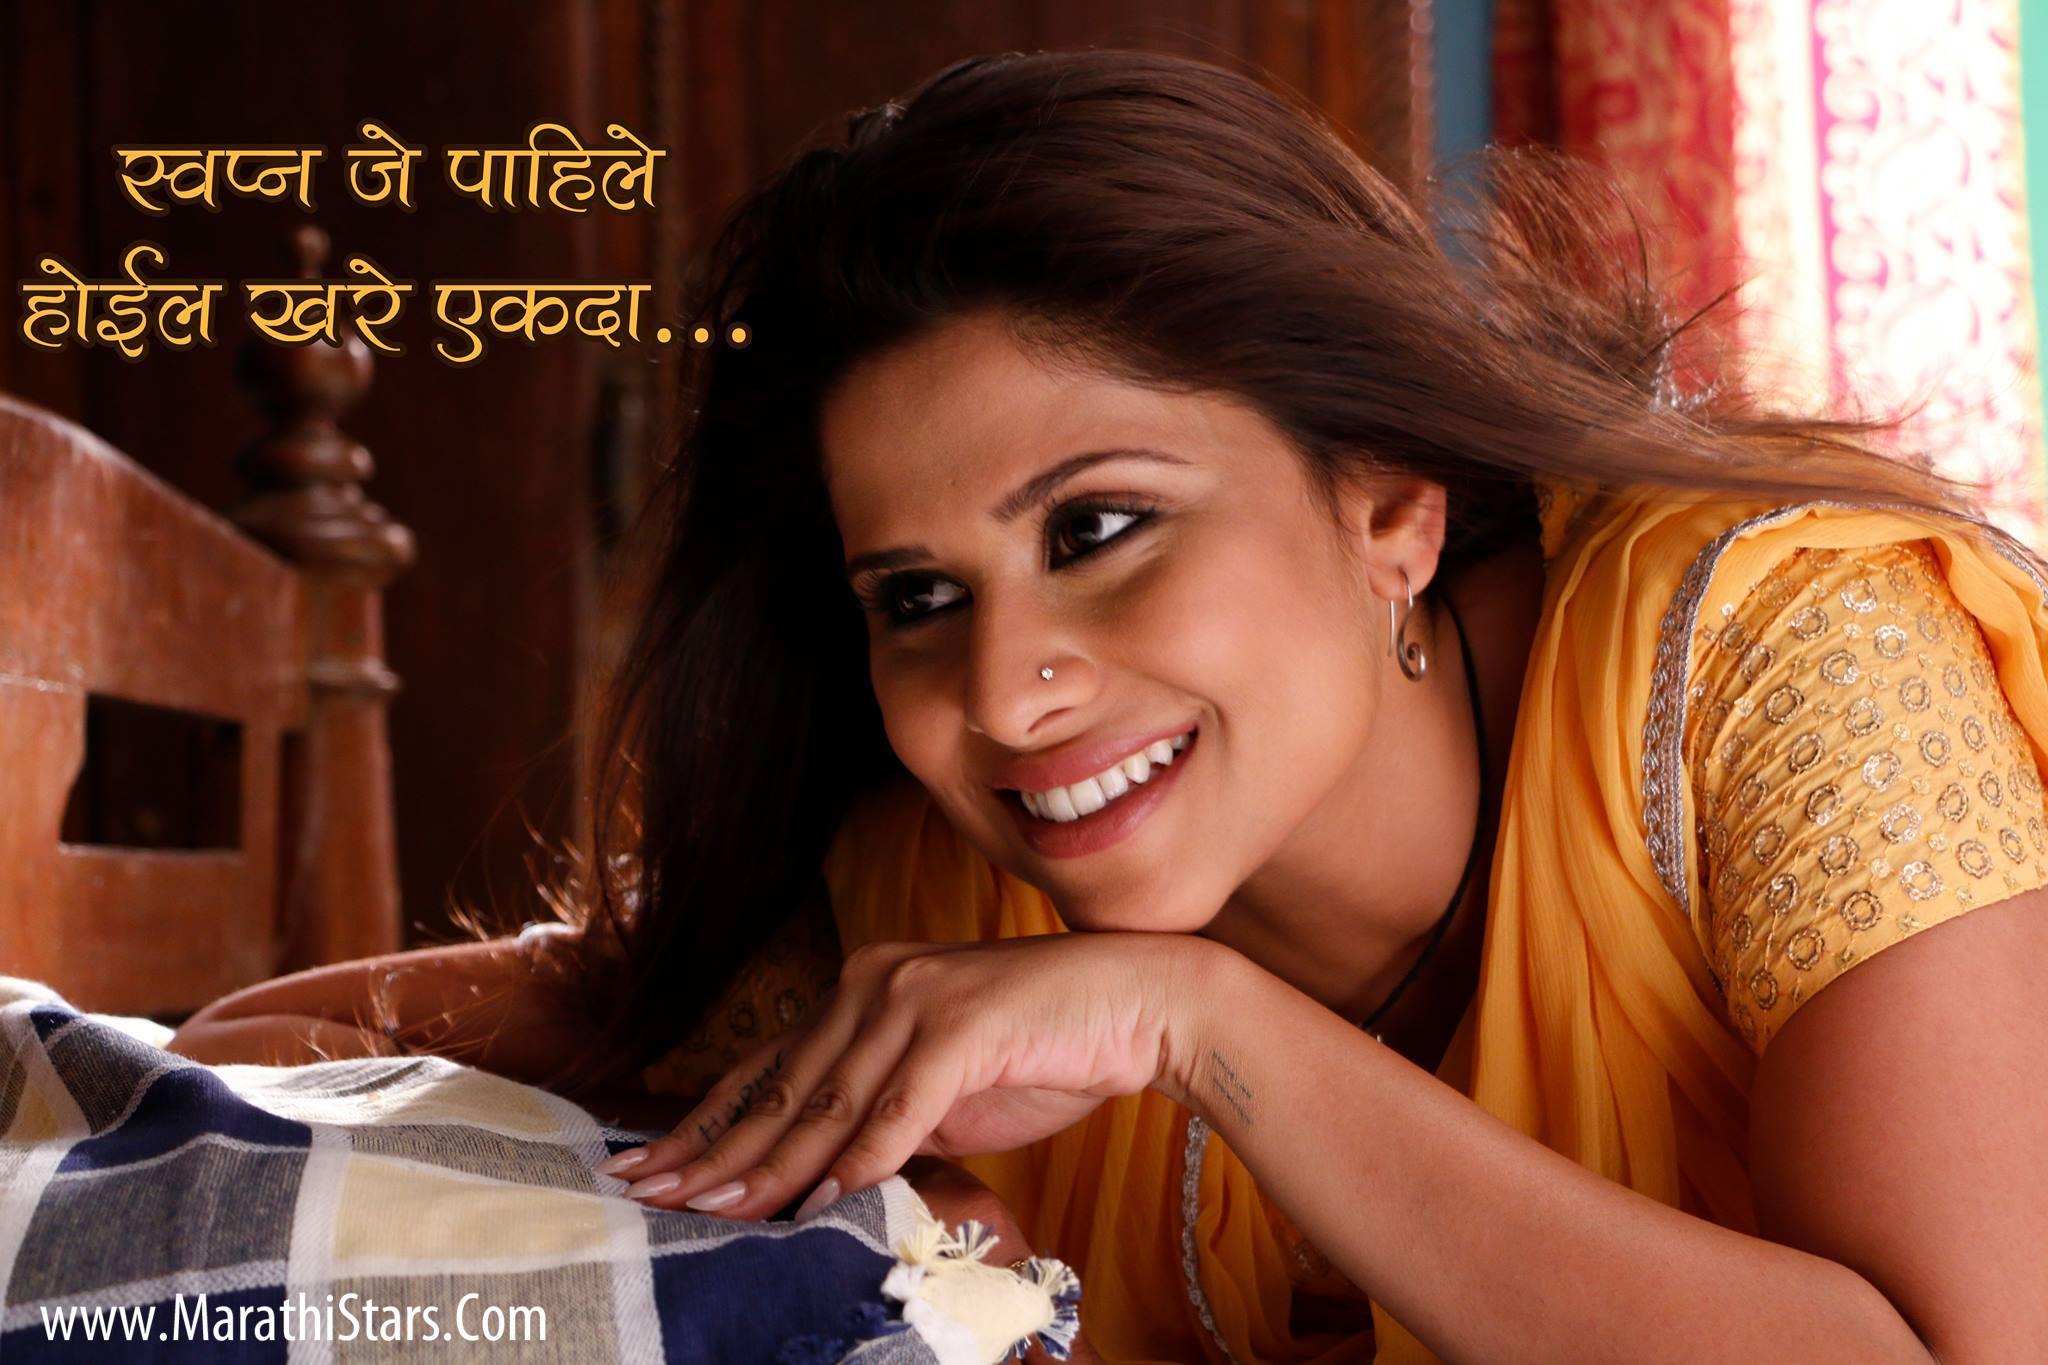 Pyar Vali Love story Marathi Movie Dialogues, Dialogue Images